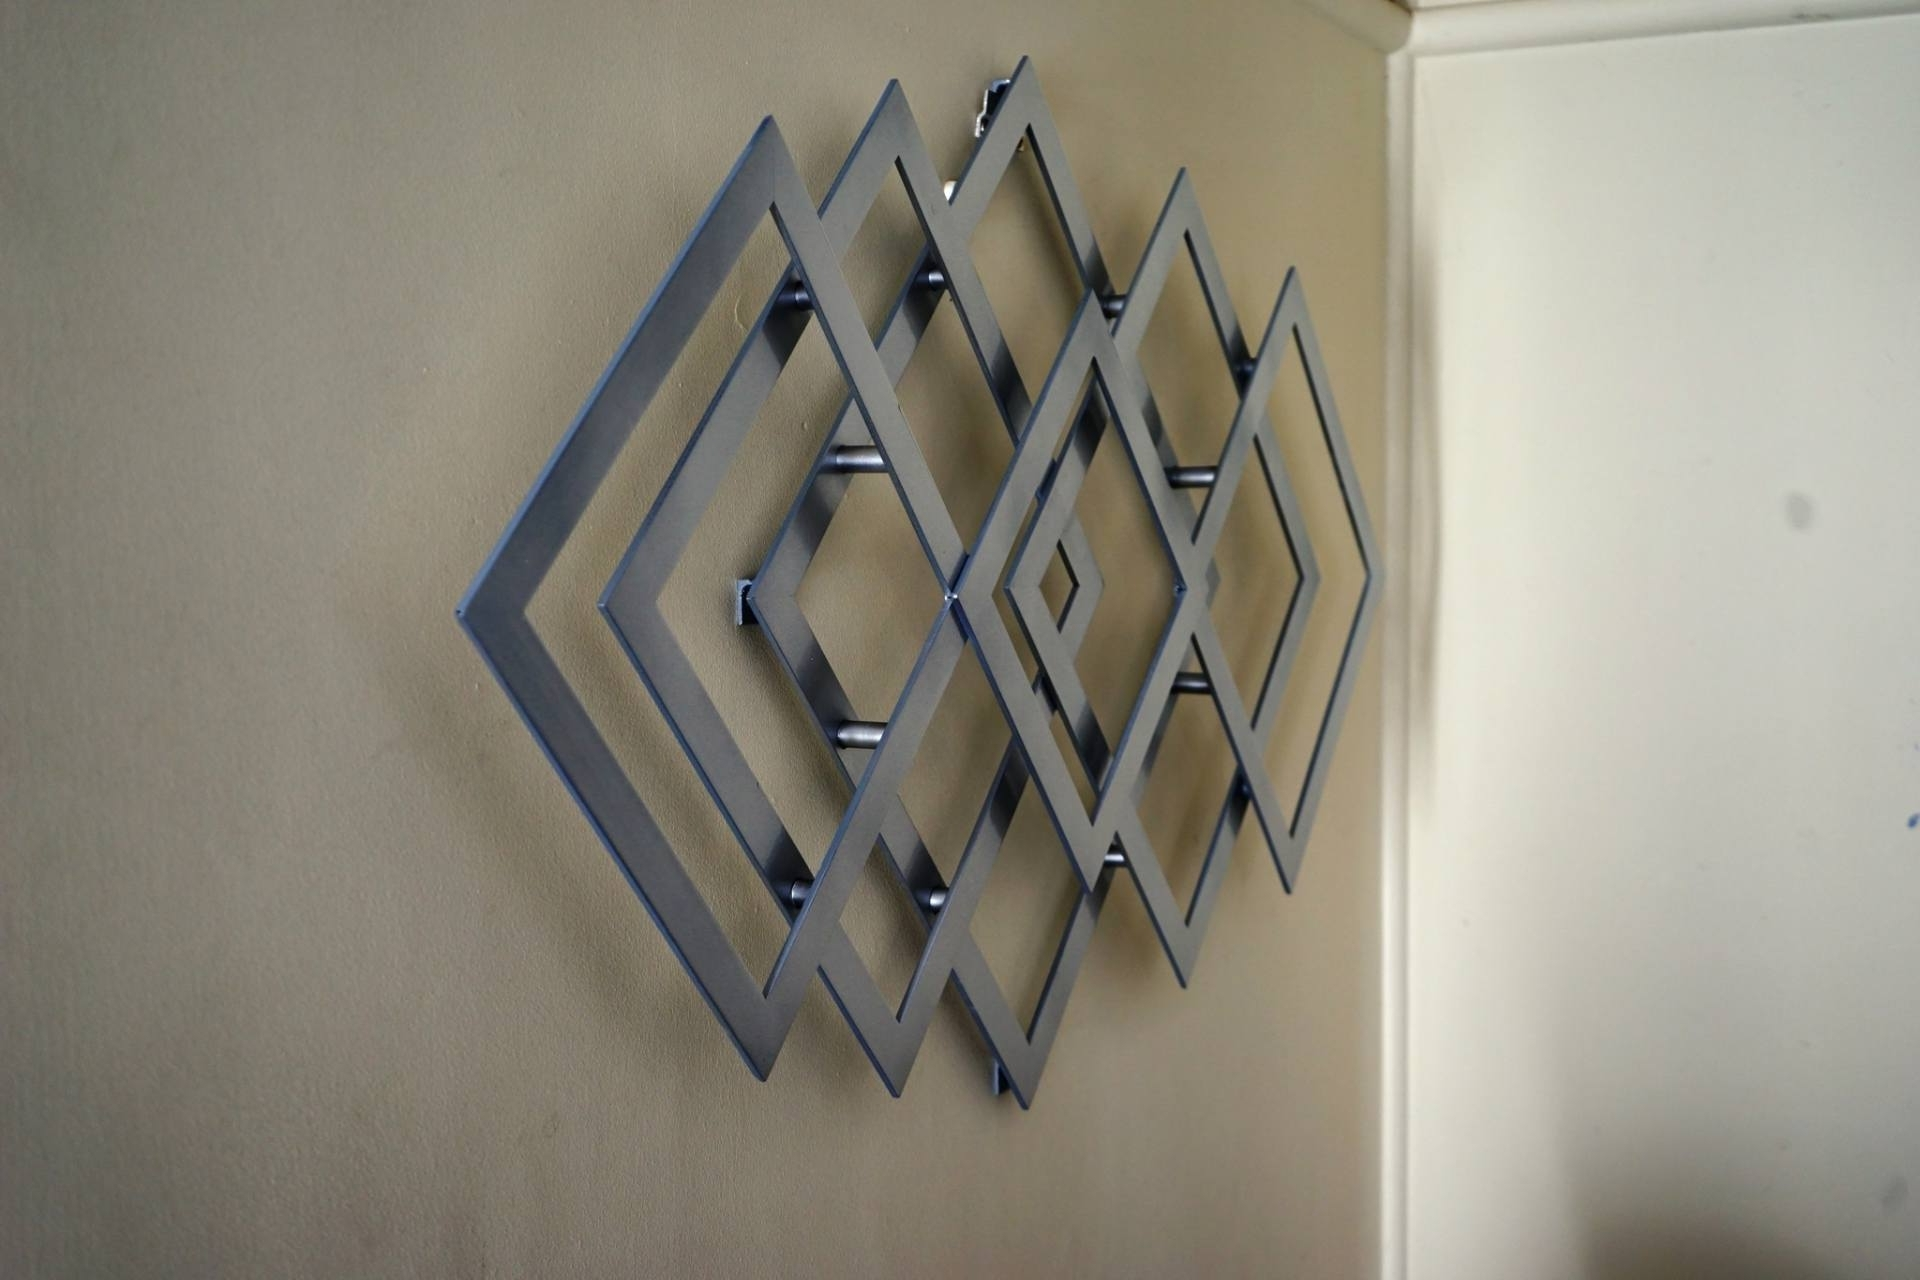 Geometric Metal Wall Art Regarding Most Recently Released Saatchi Art: Geometric Metal Wall Art Sculpturealdo Milin (View 4 of 15)